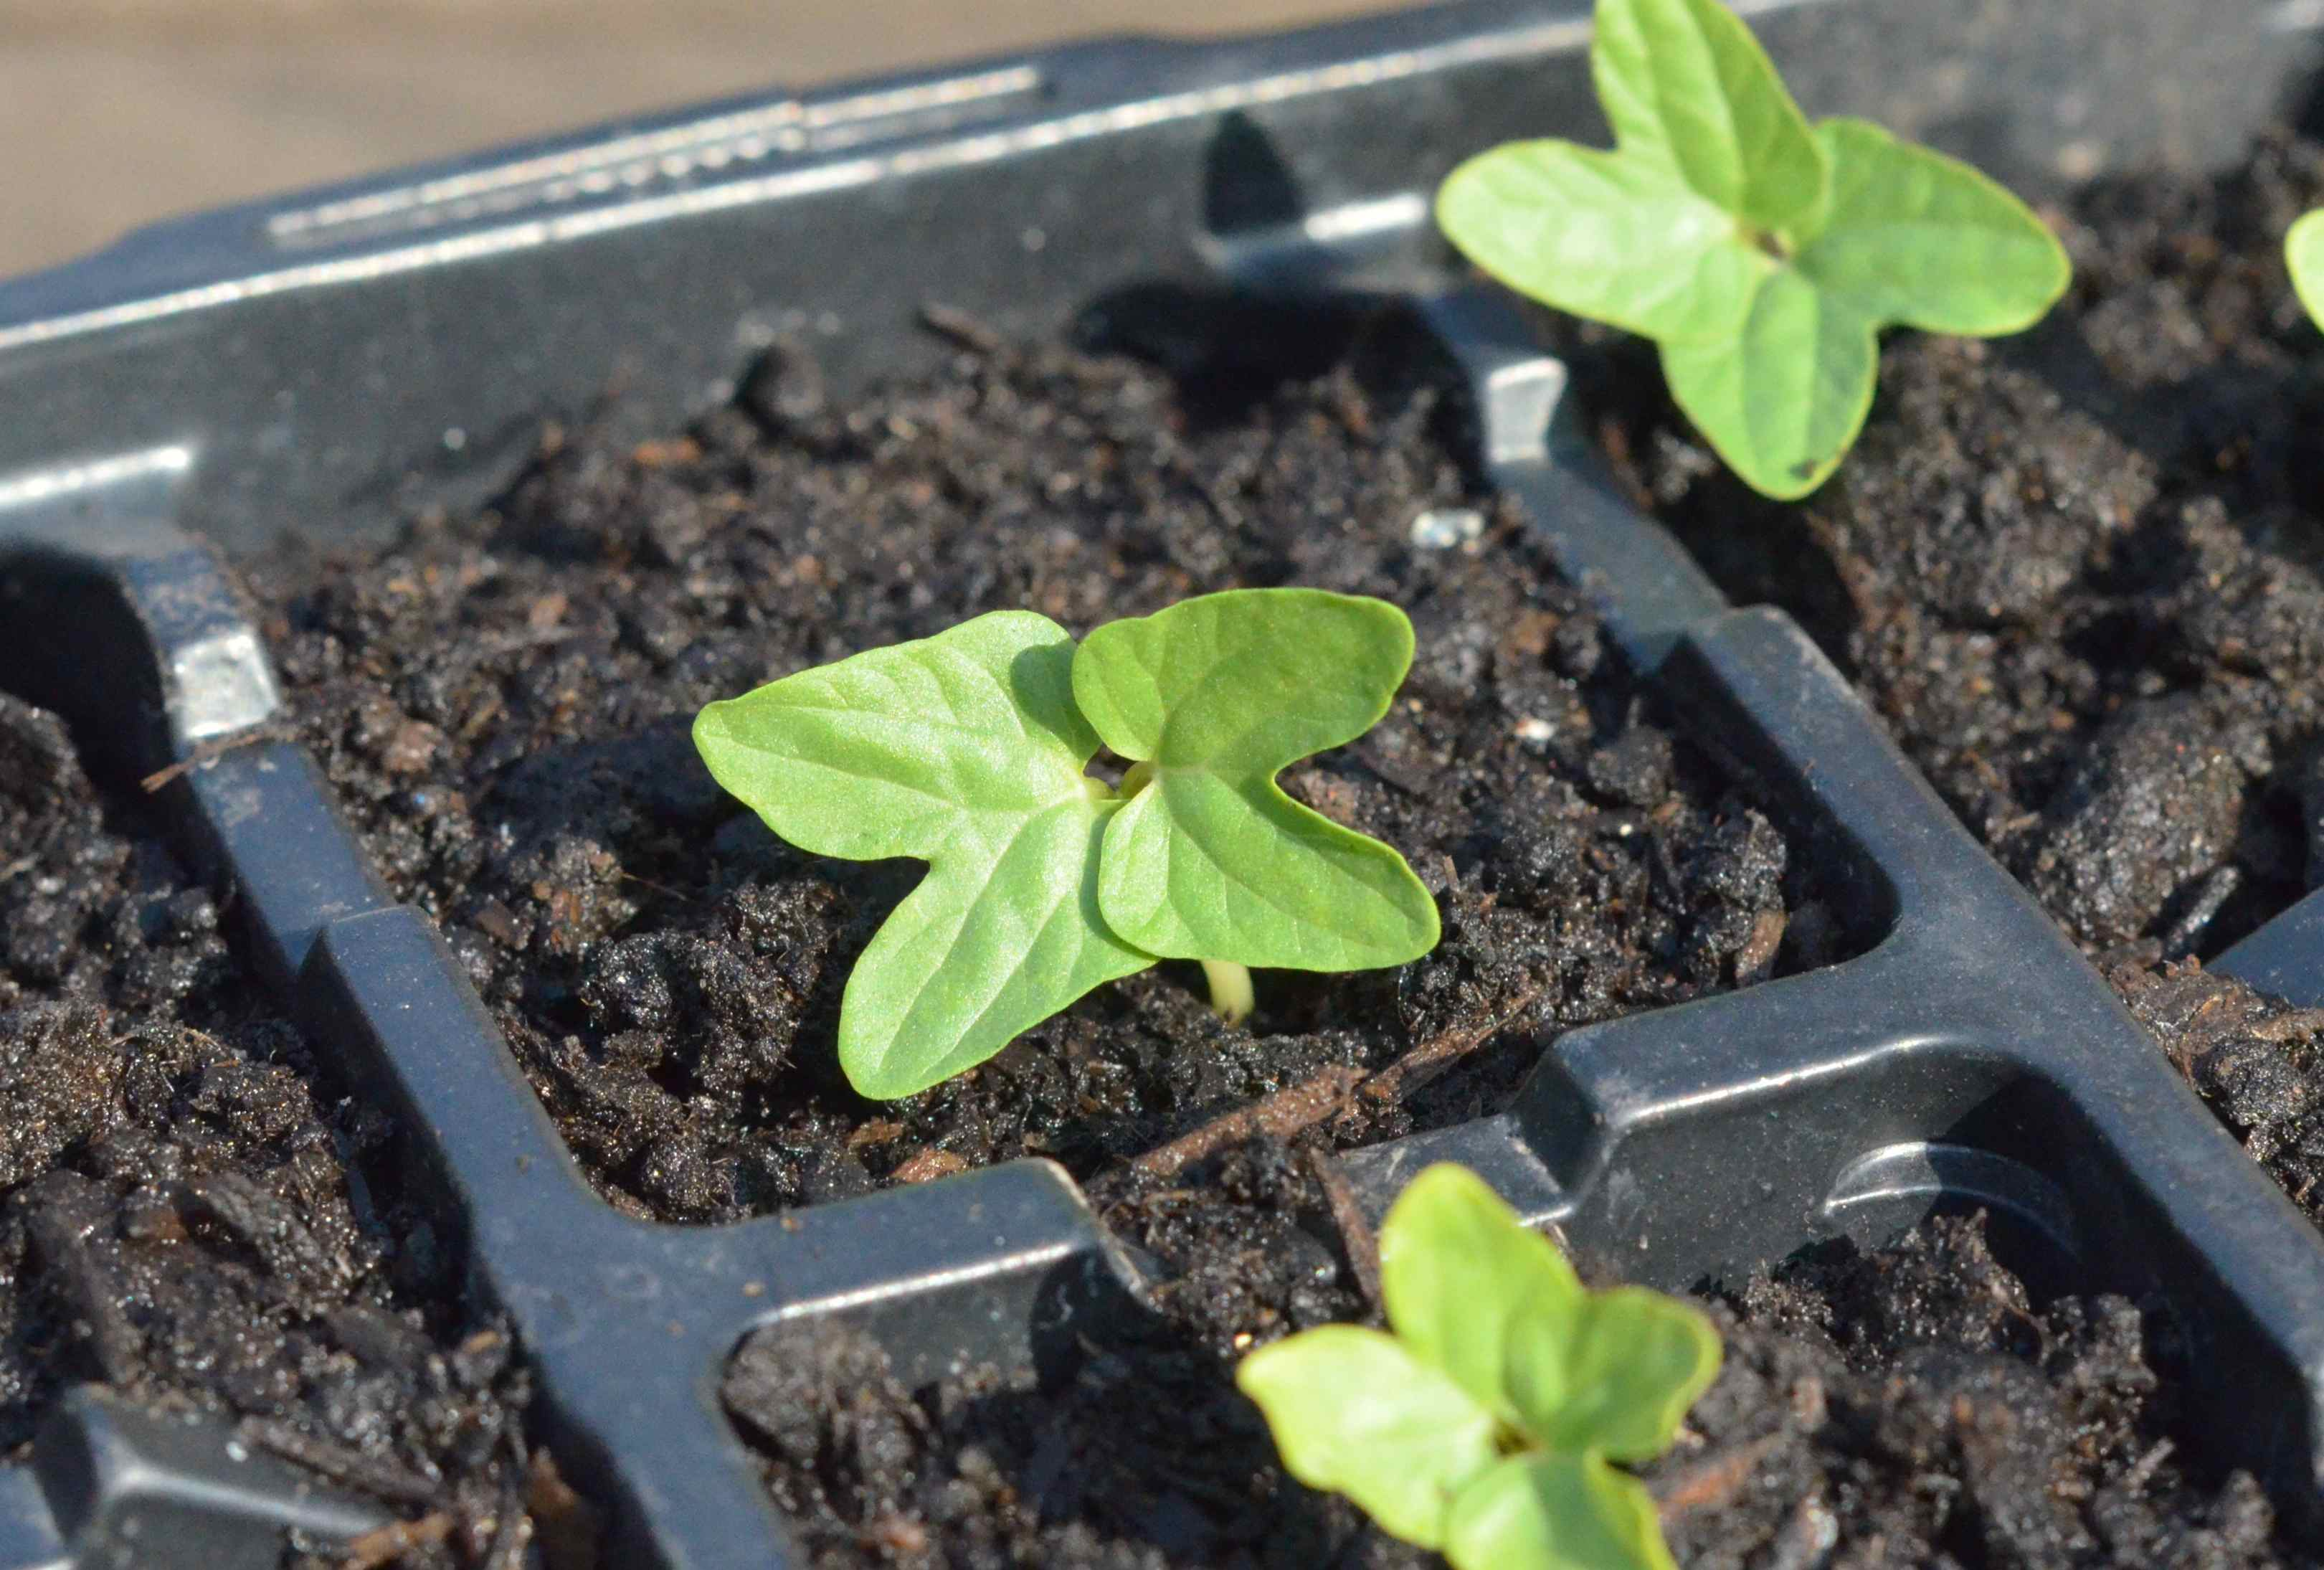 ipomoea seedling